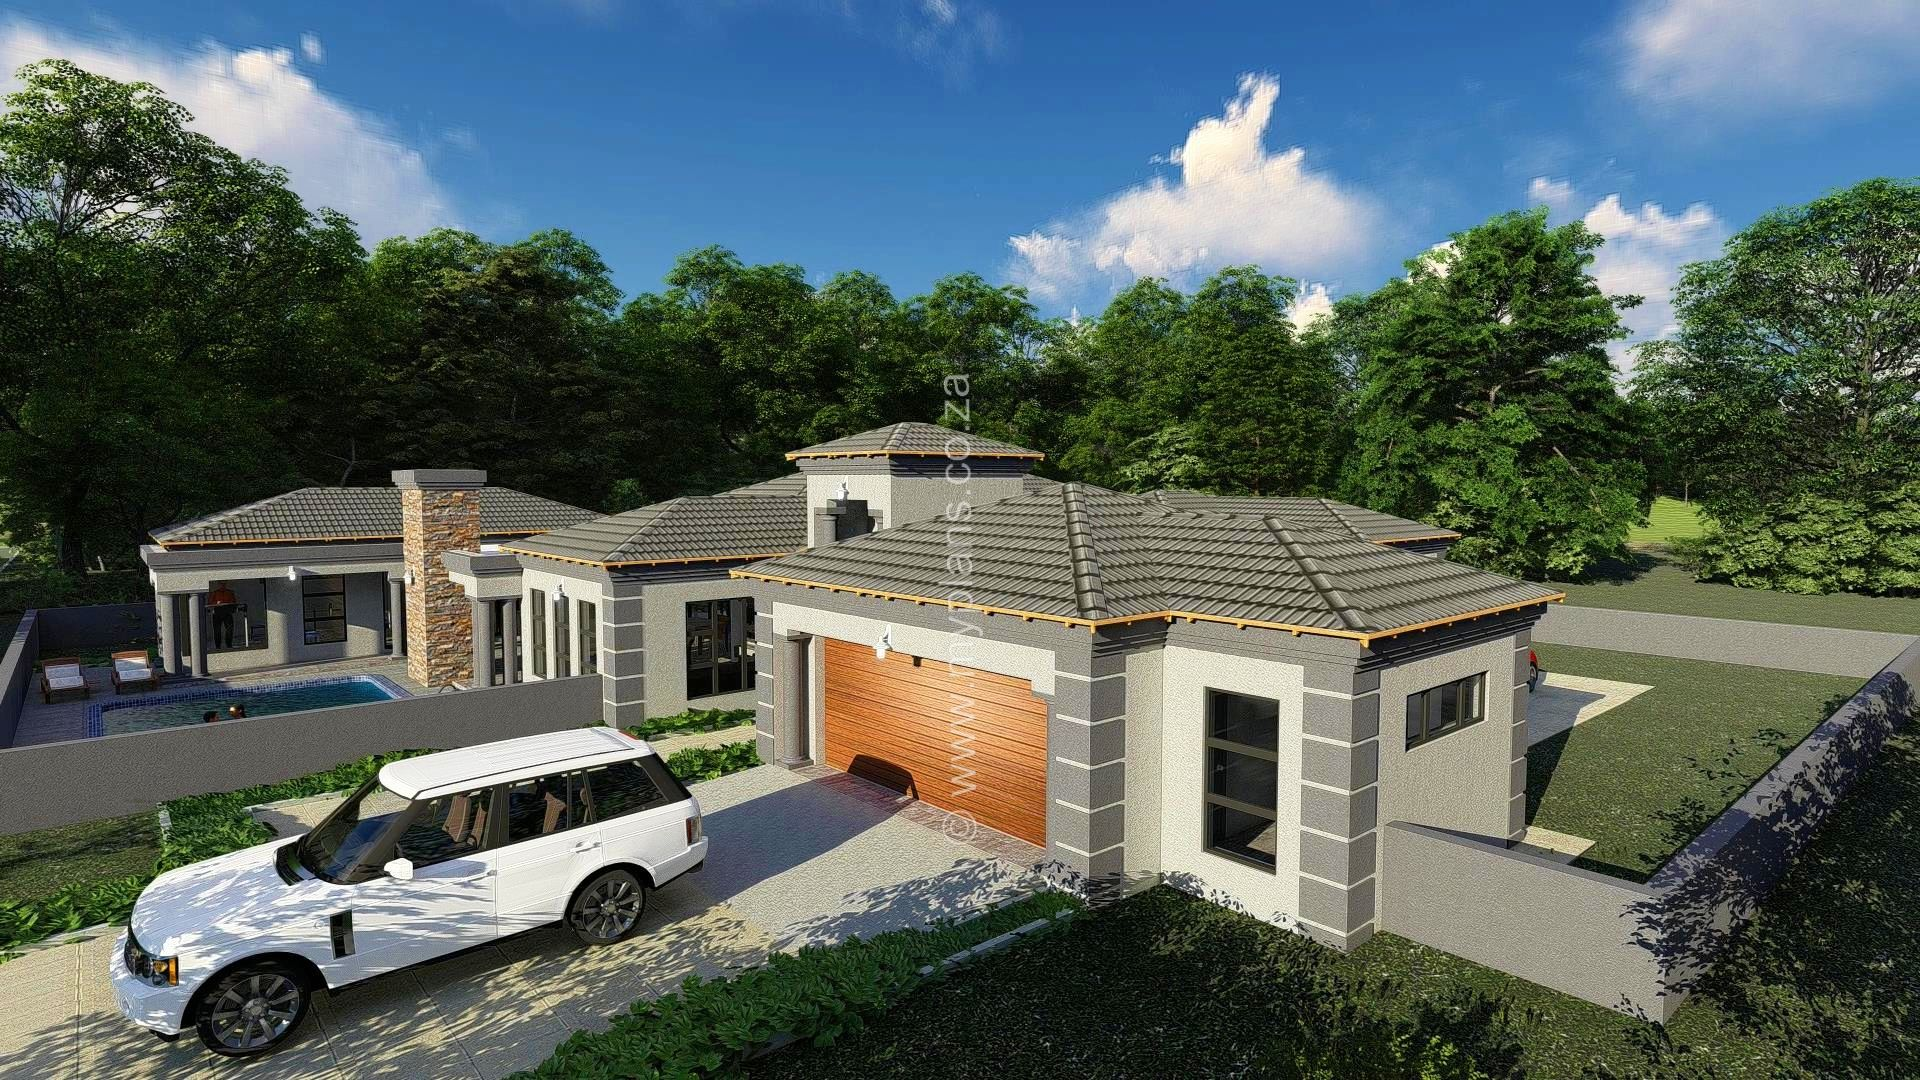 5 Bedroom House Plan Bla 021 9s 5 Bedroom House Plans House Plans Bedroom House Plans